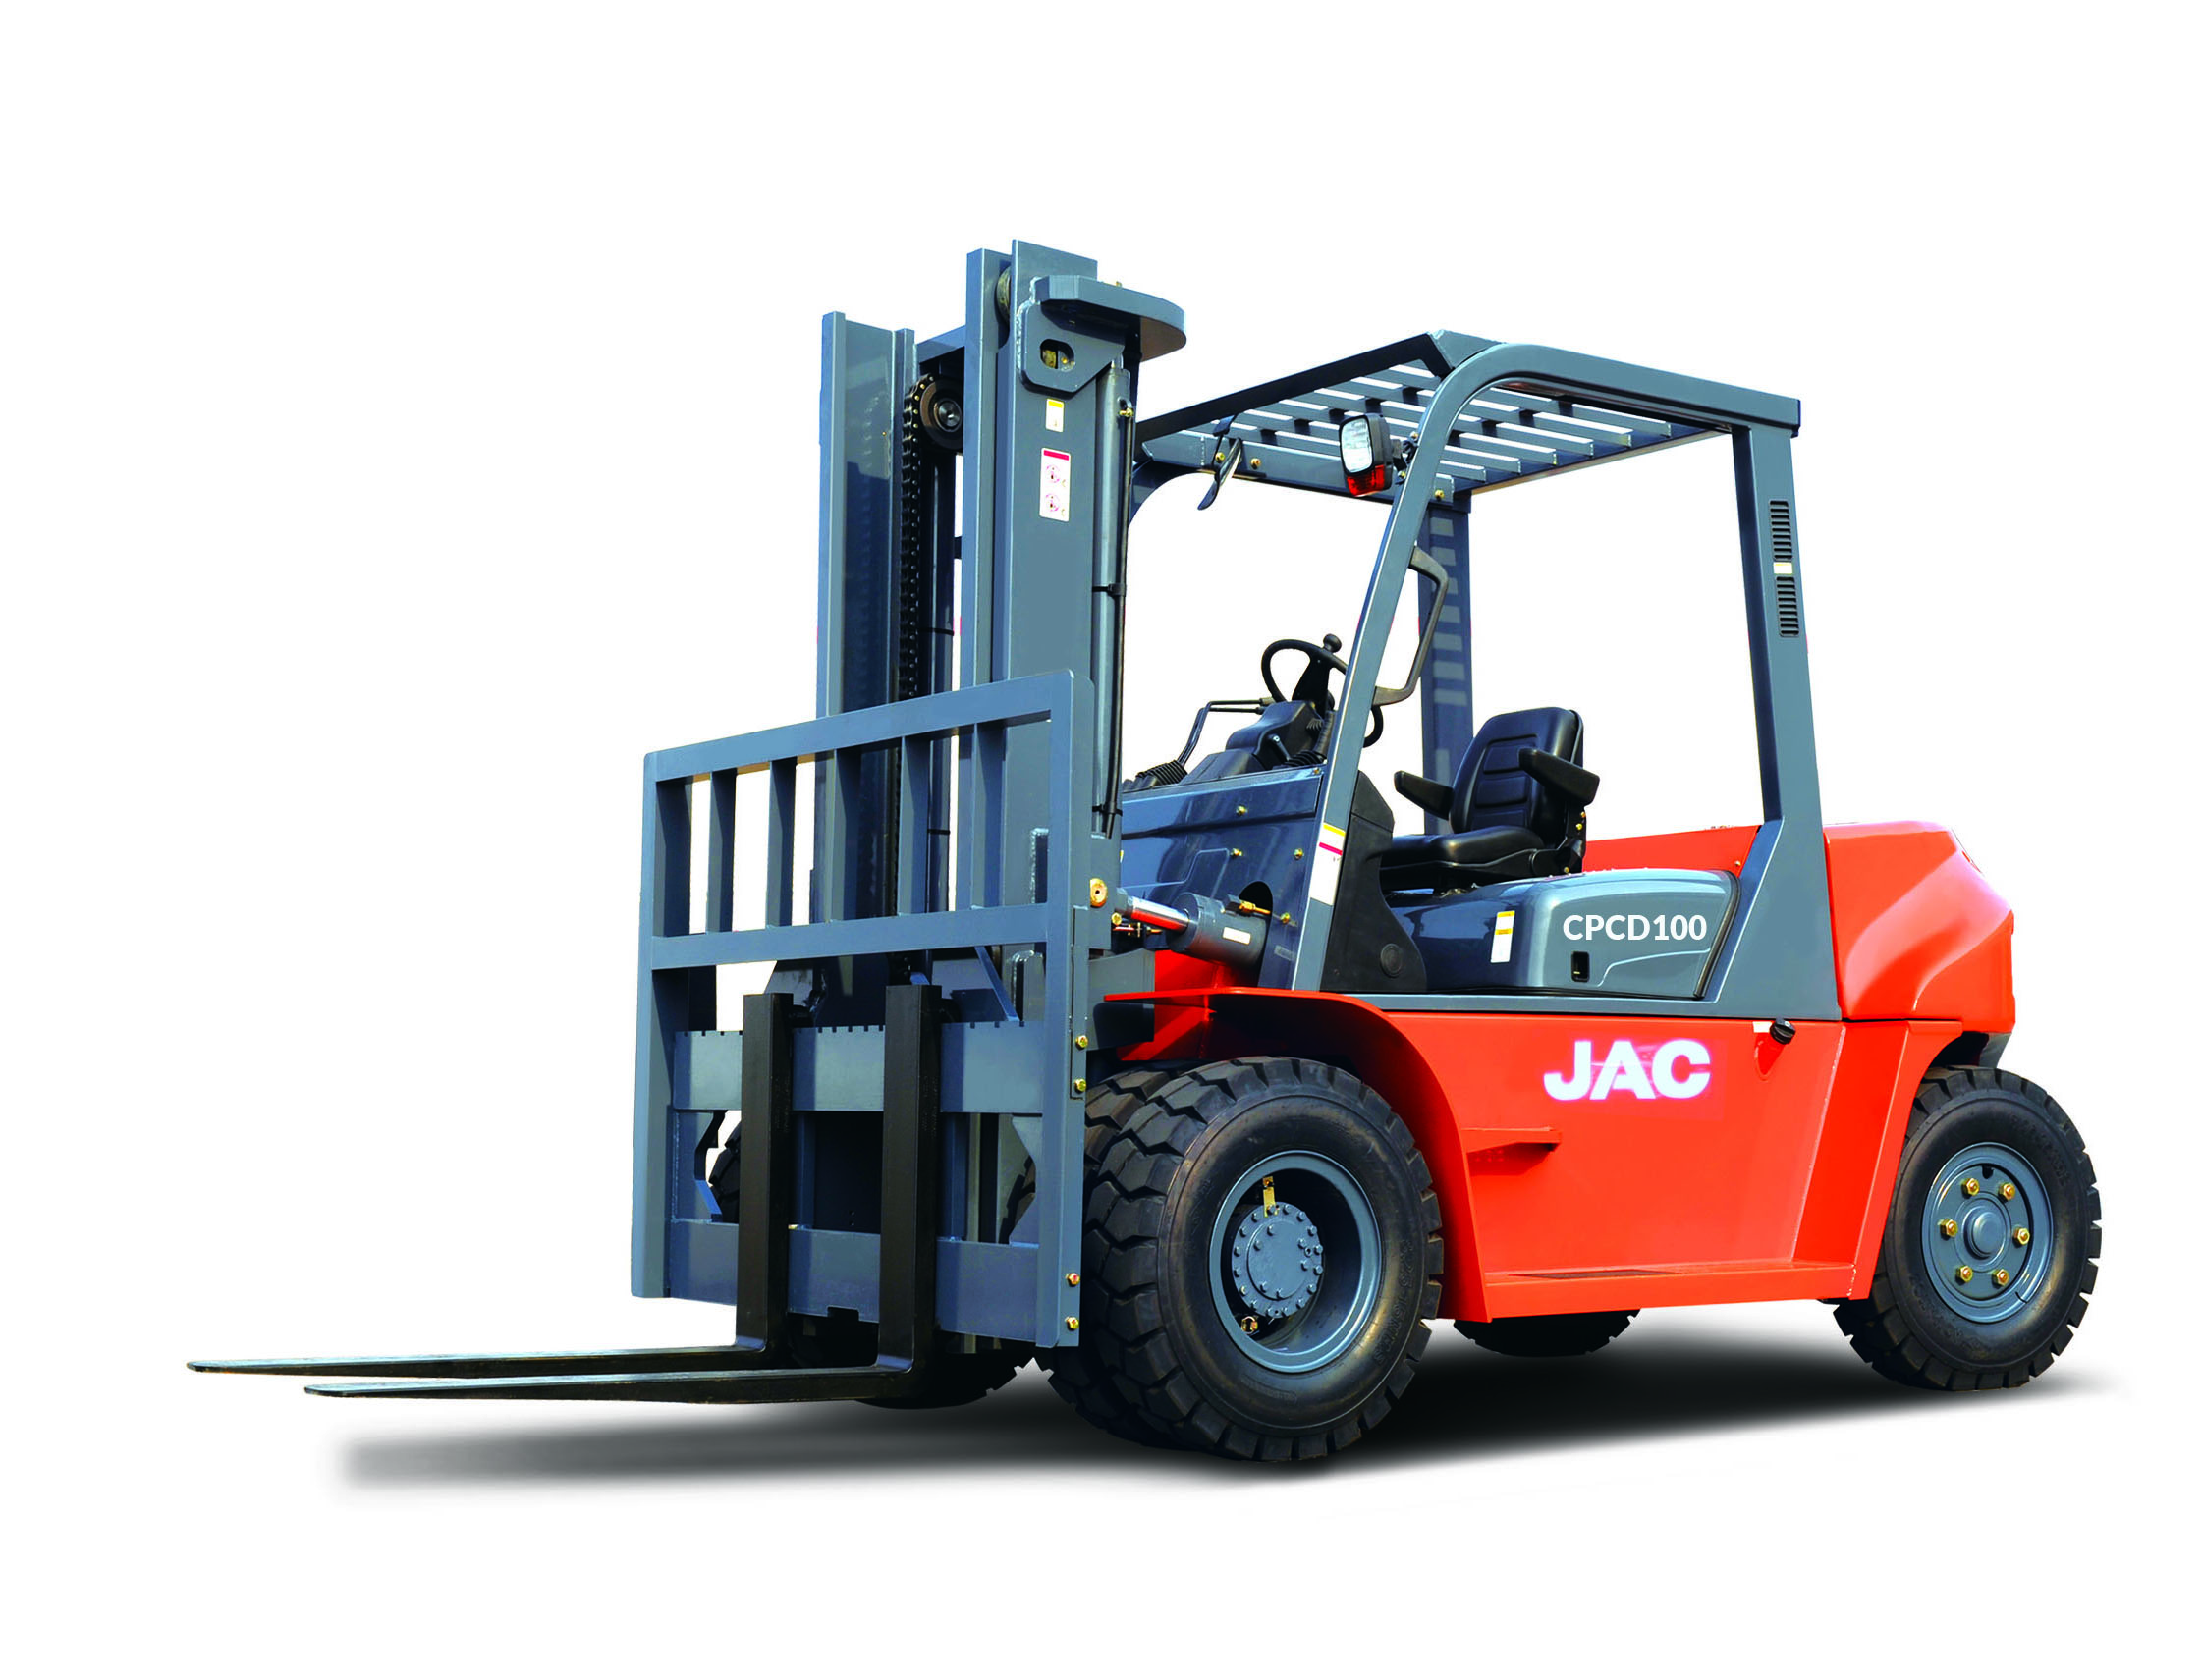 10 Ton Fork Lift : Cpcd ton jac forklifts